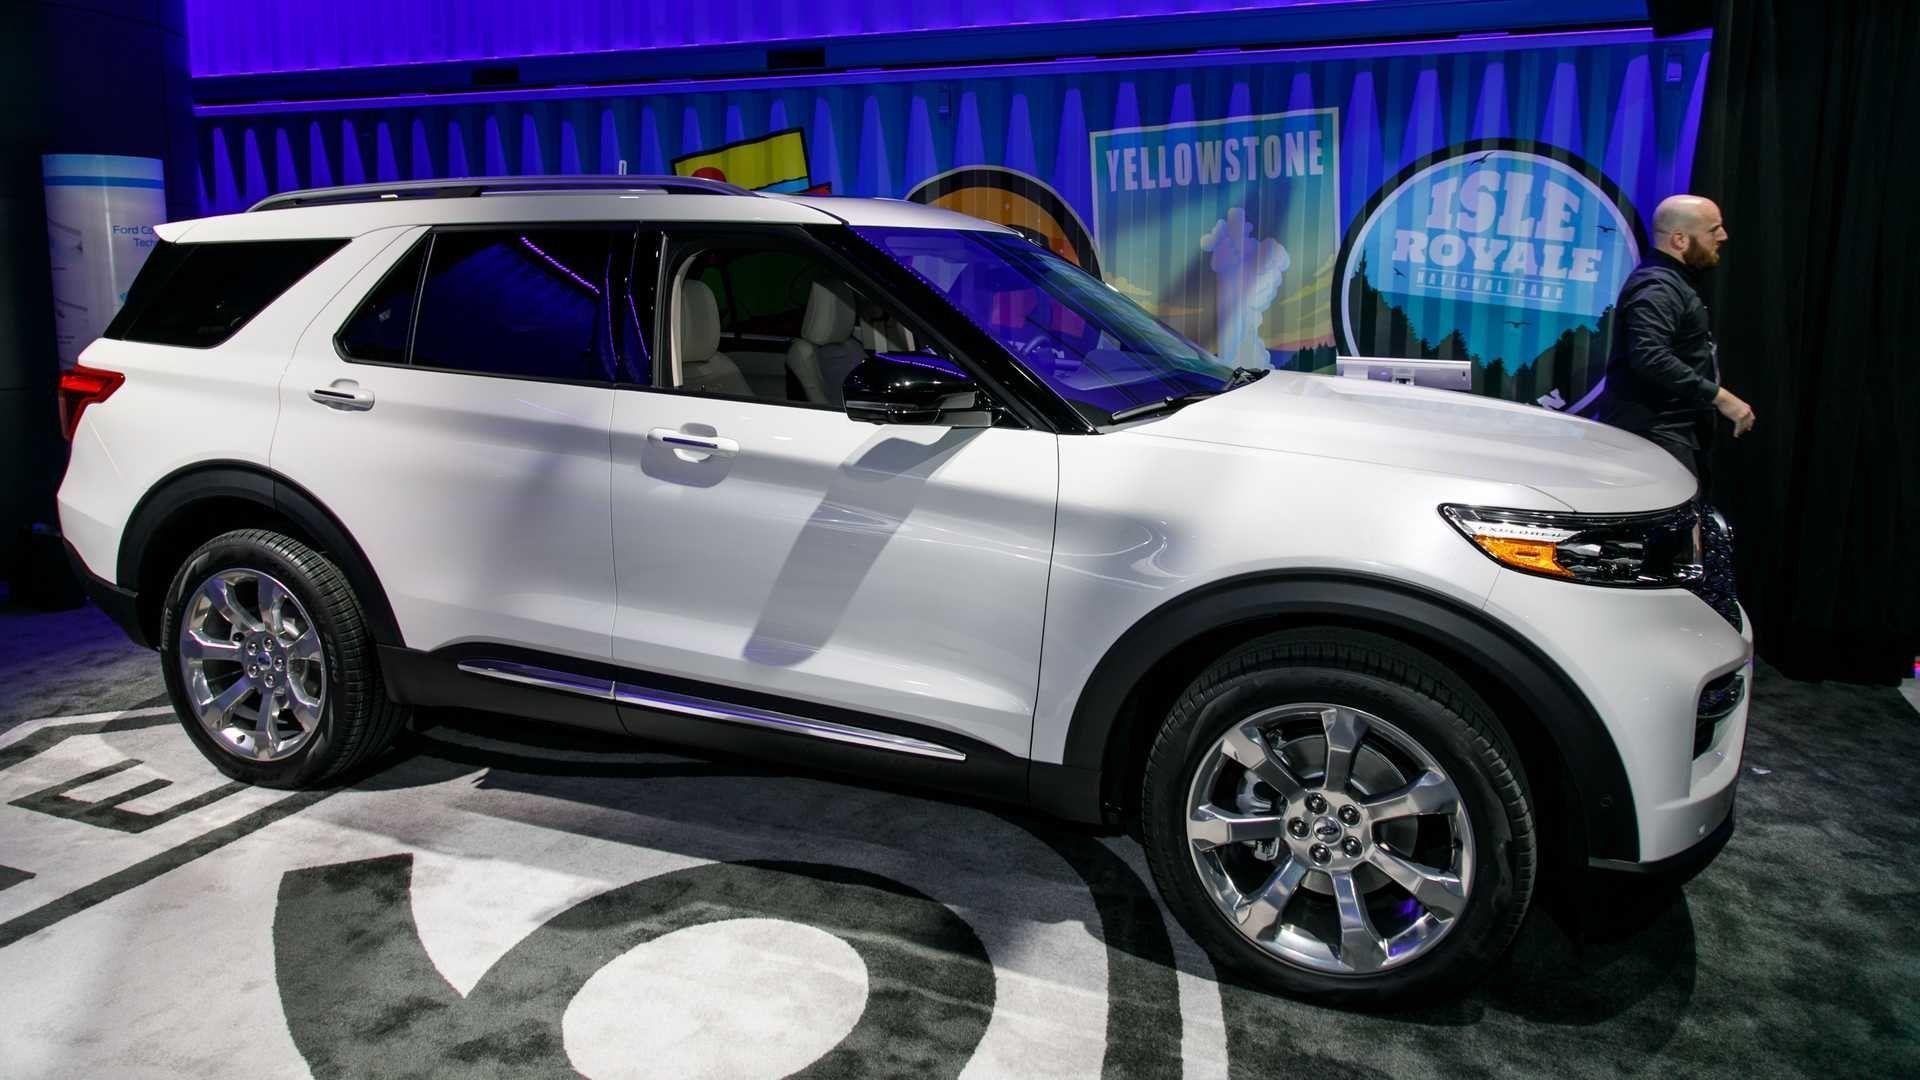 New 2019 Ford Edge Suv St Agate Black For Sale Medford Or Lithia